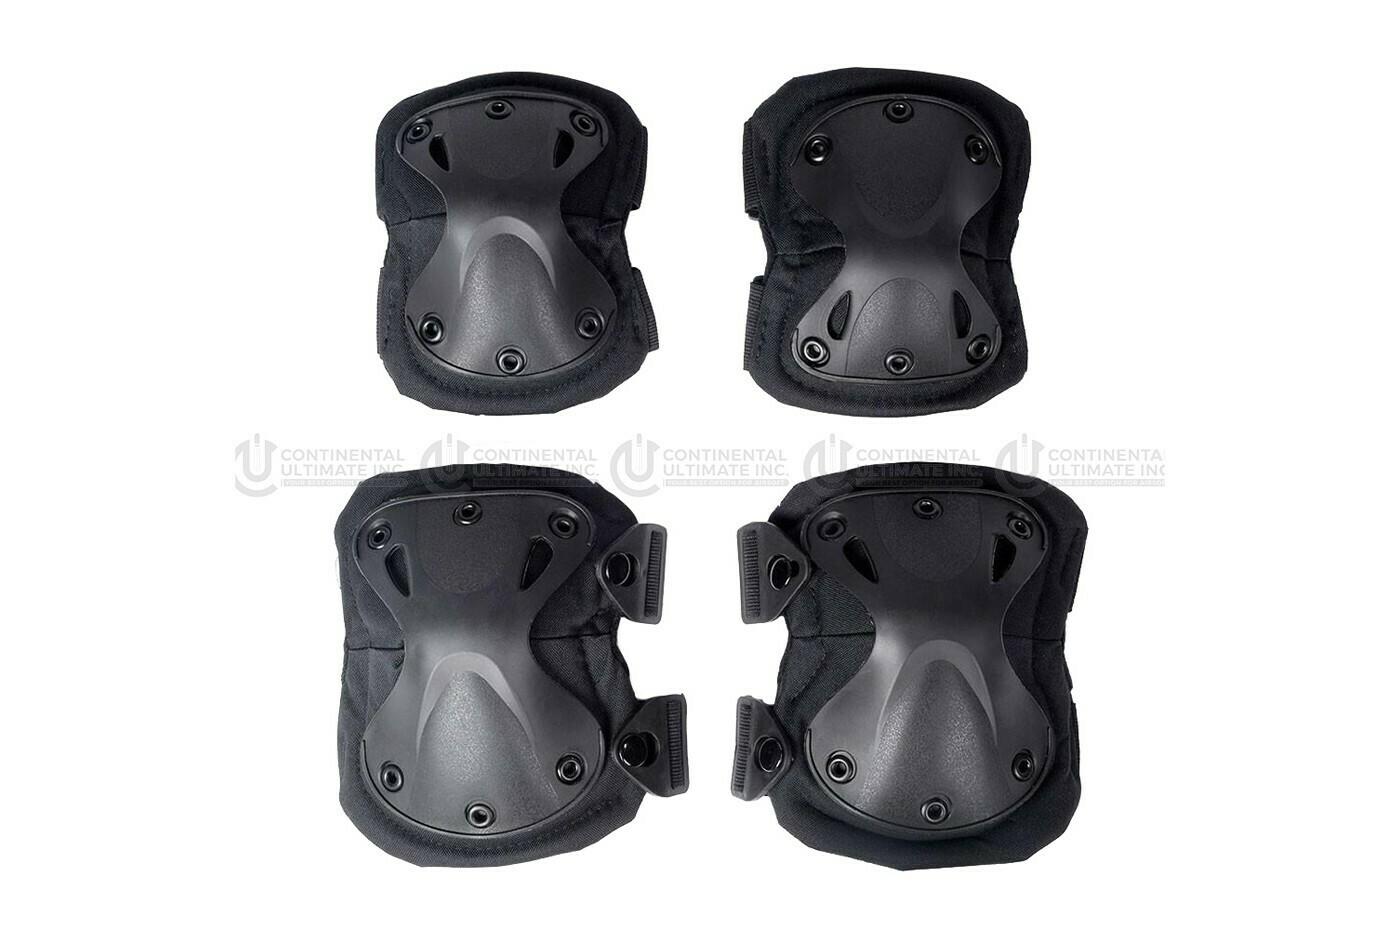 KROUSIS Tactical Knee & Elbow Pad Set